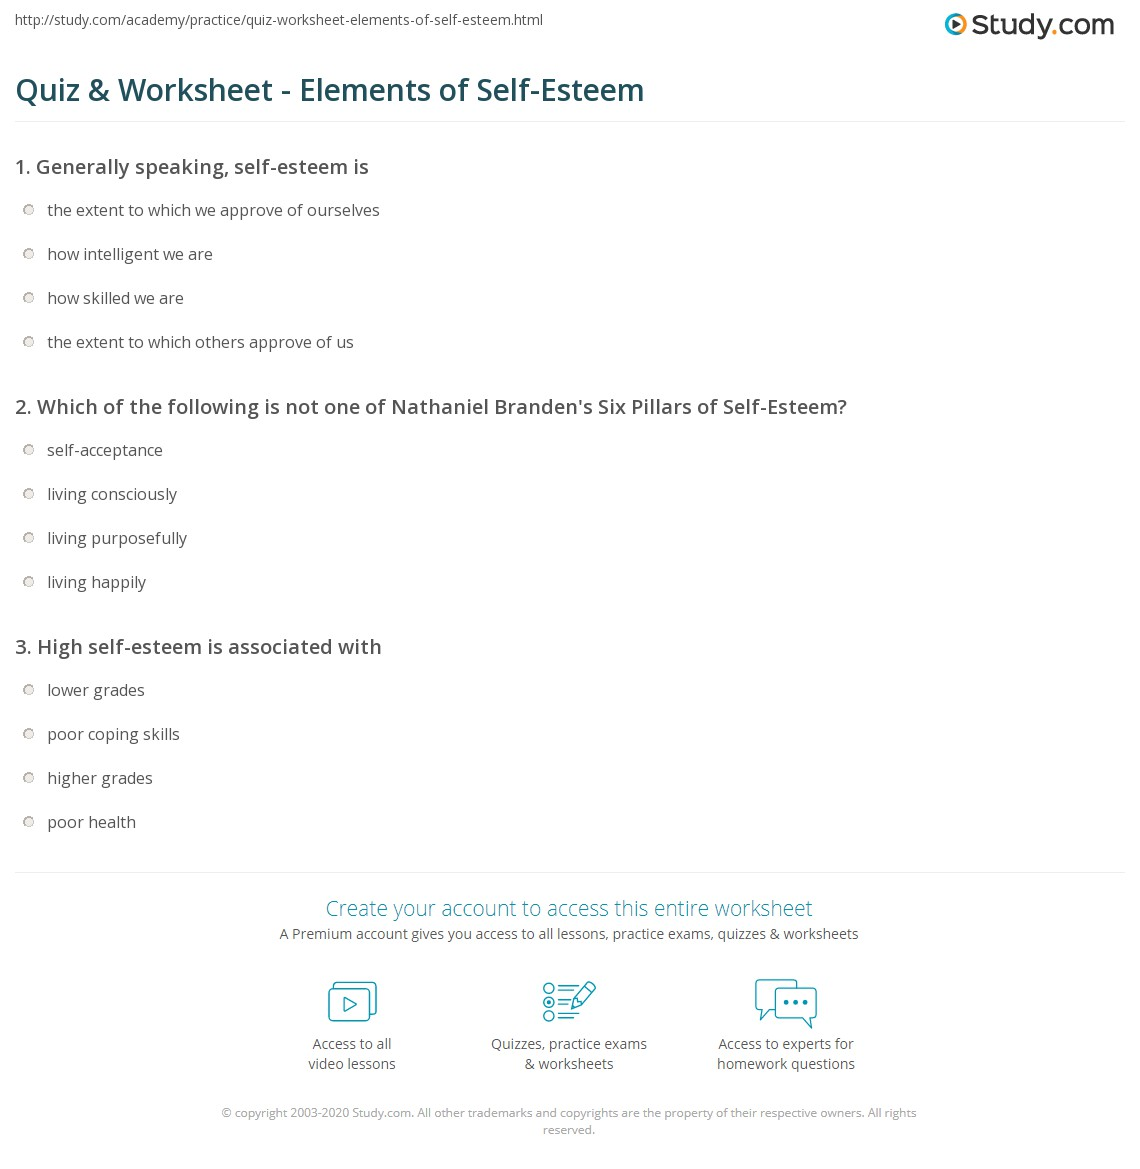 Worksheets Self Esteem Worksheet quiz worksheet elements of self esteem study com print what is definition six pillars issues worksheet